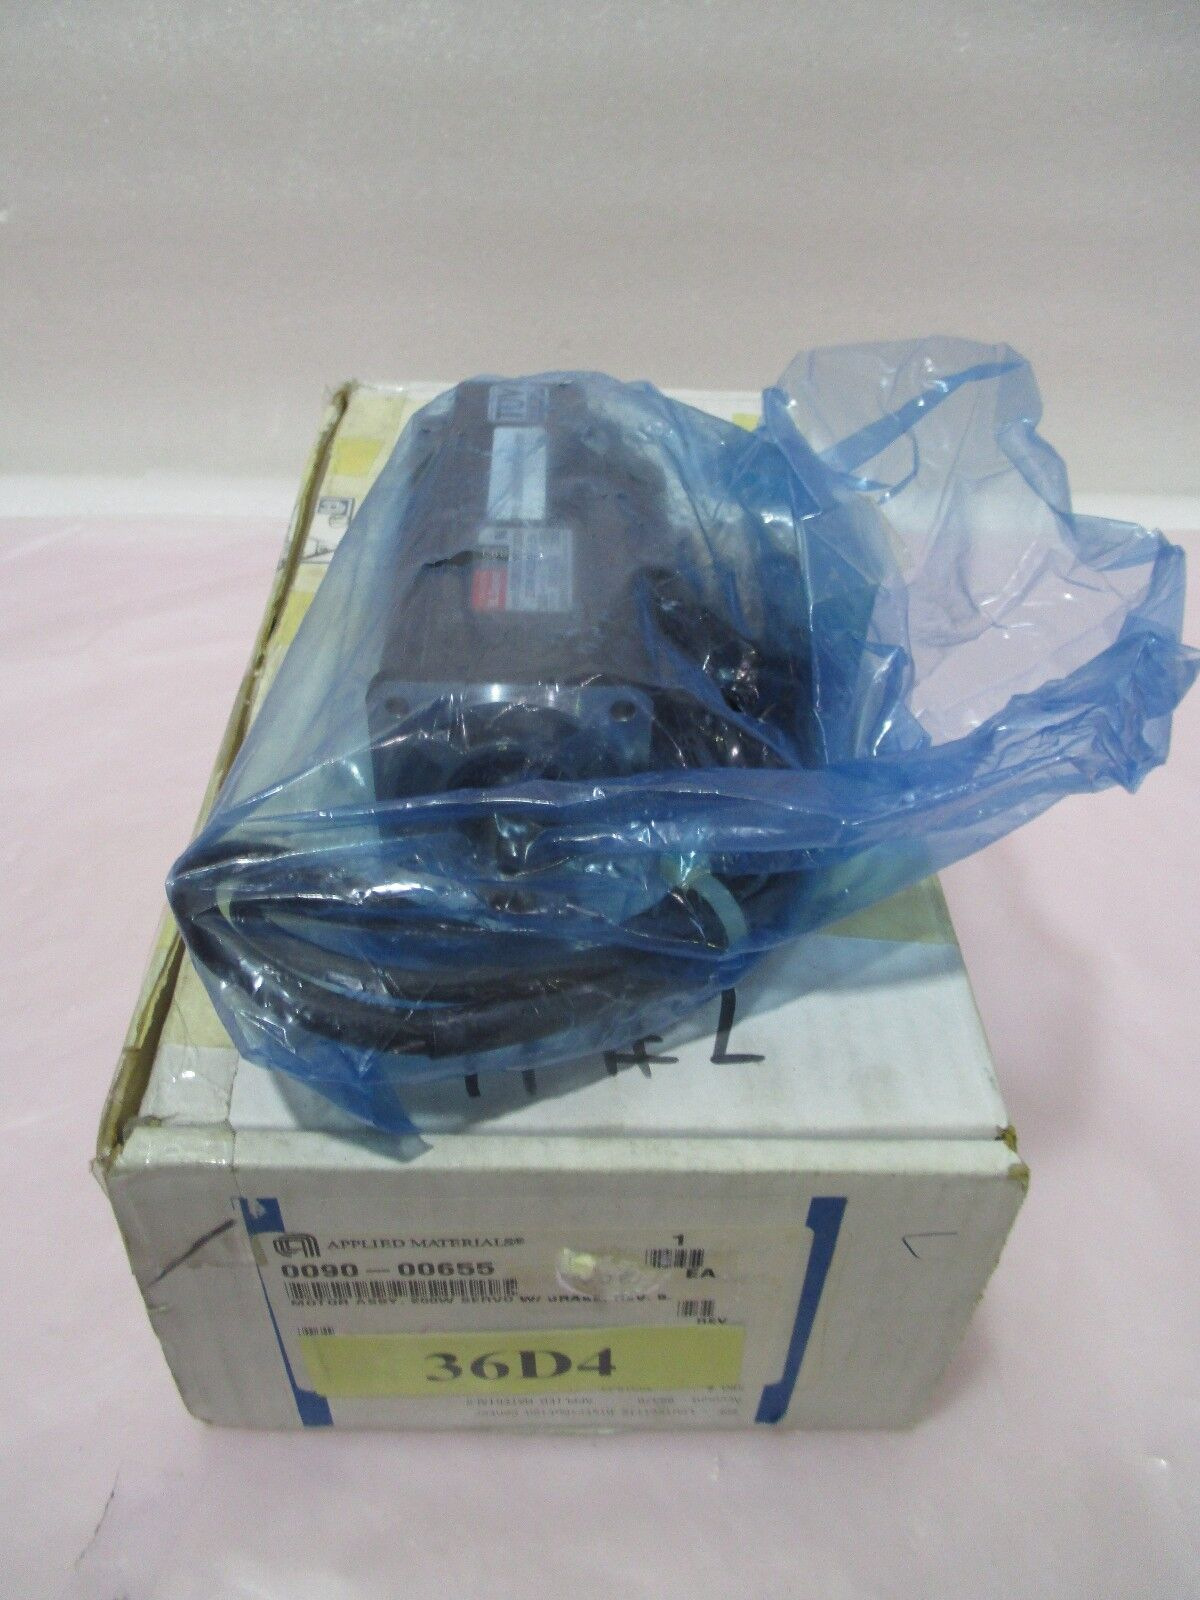 AMAT 0090-00655 Motor Assembly, 200w, Servo W/ Brake, Sanyo Denki, 421898